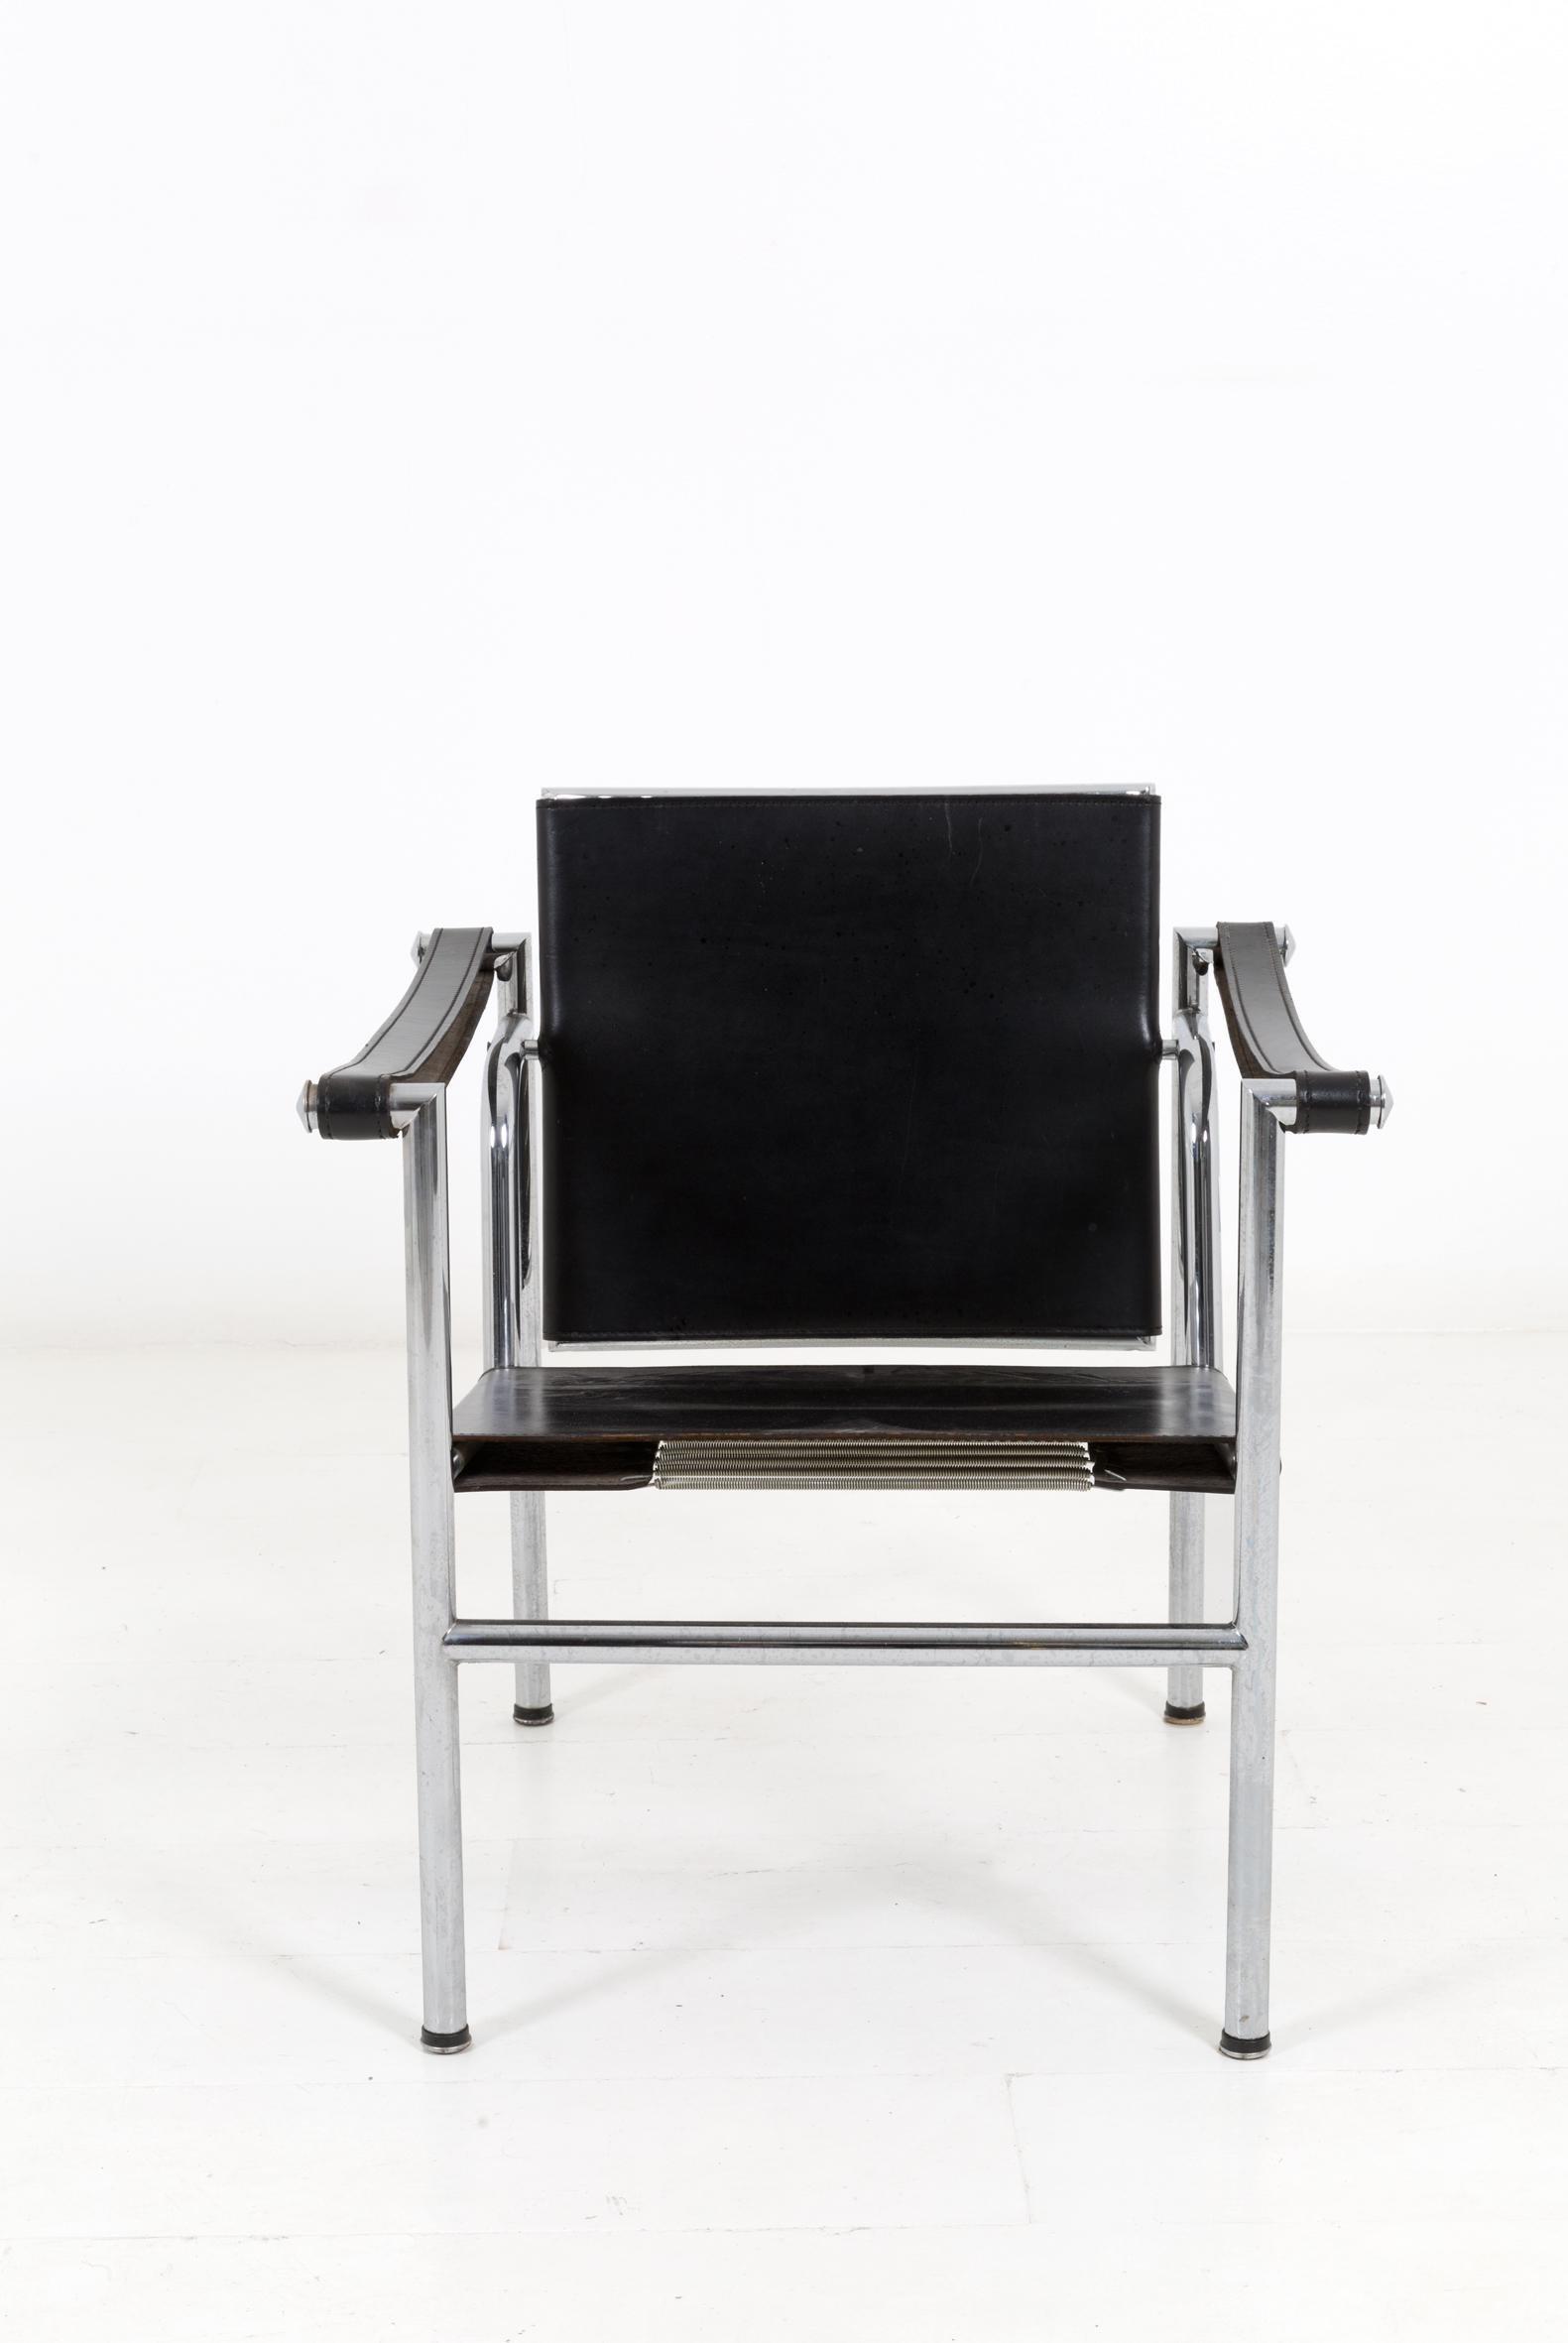 LE CORBUSIER. LC1 armchair. Unknown production